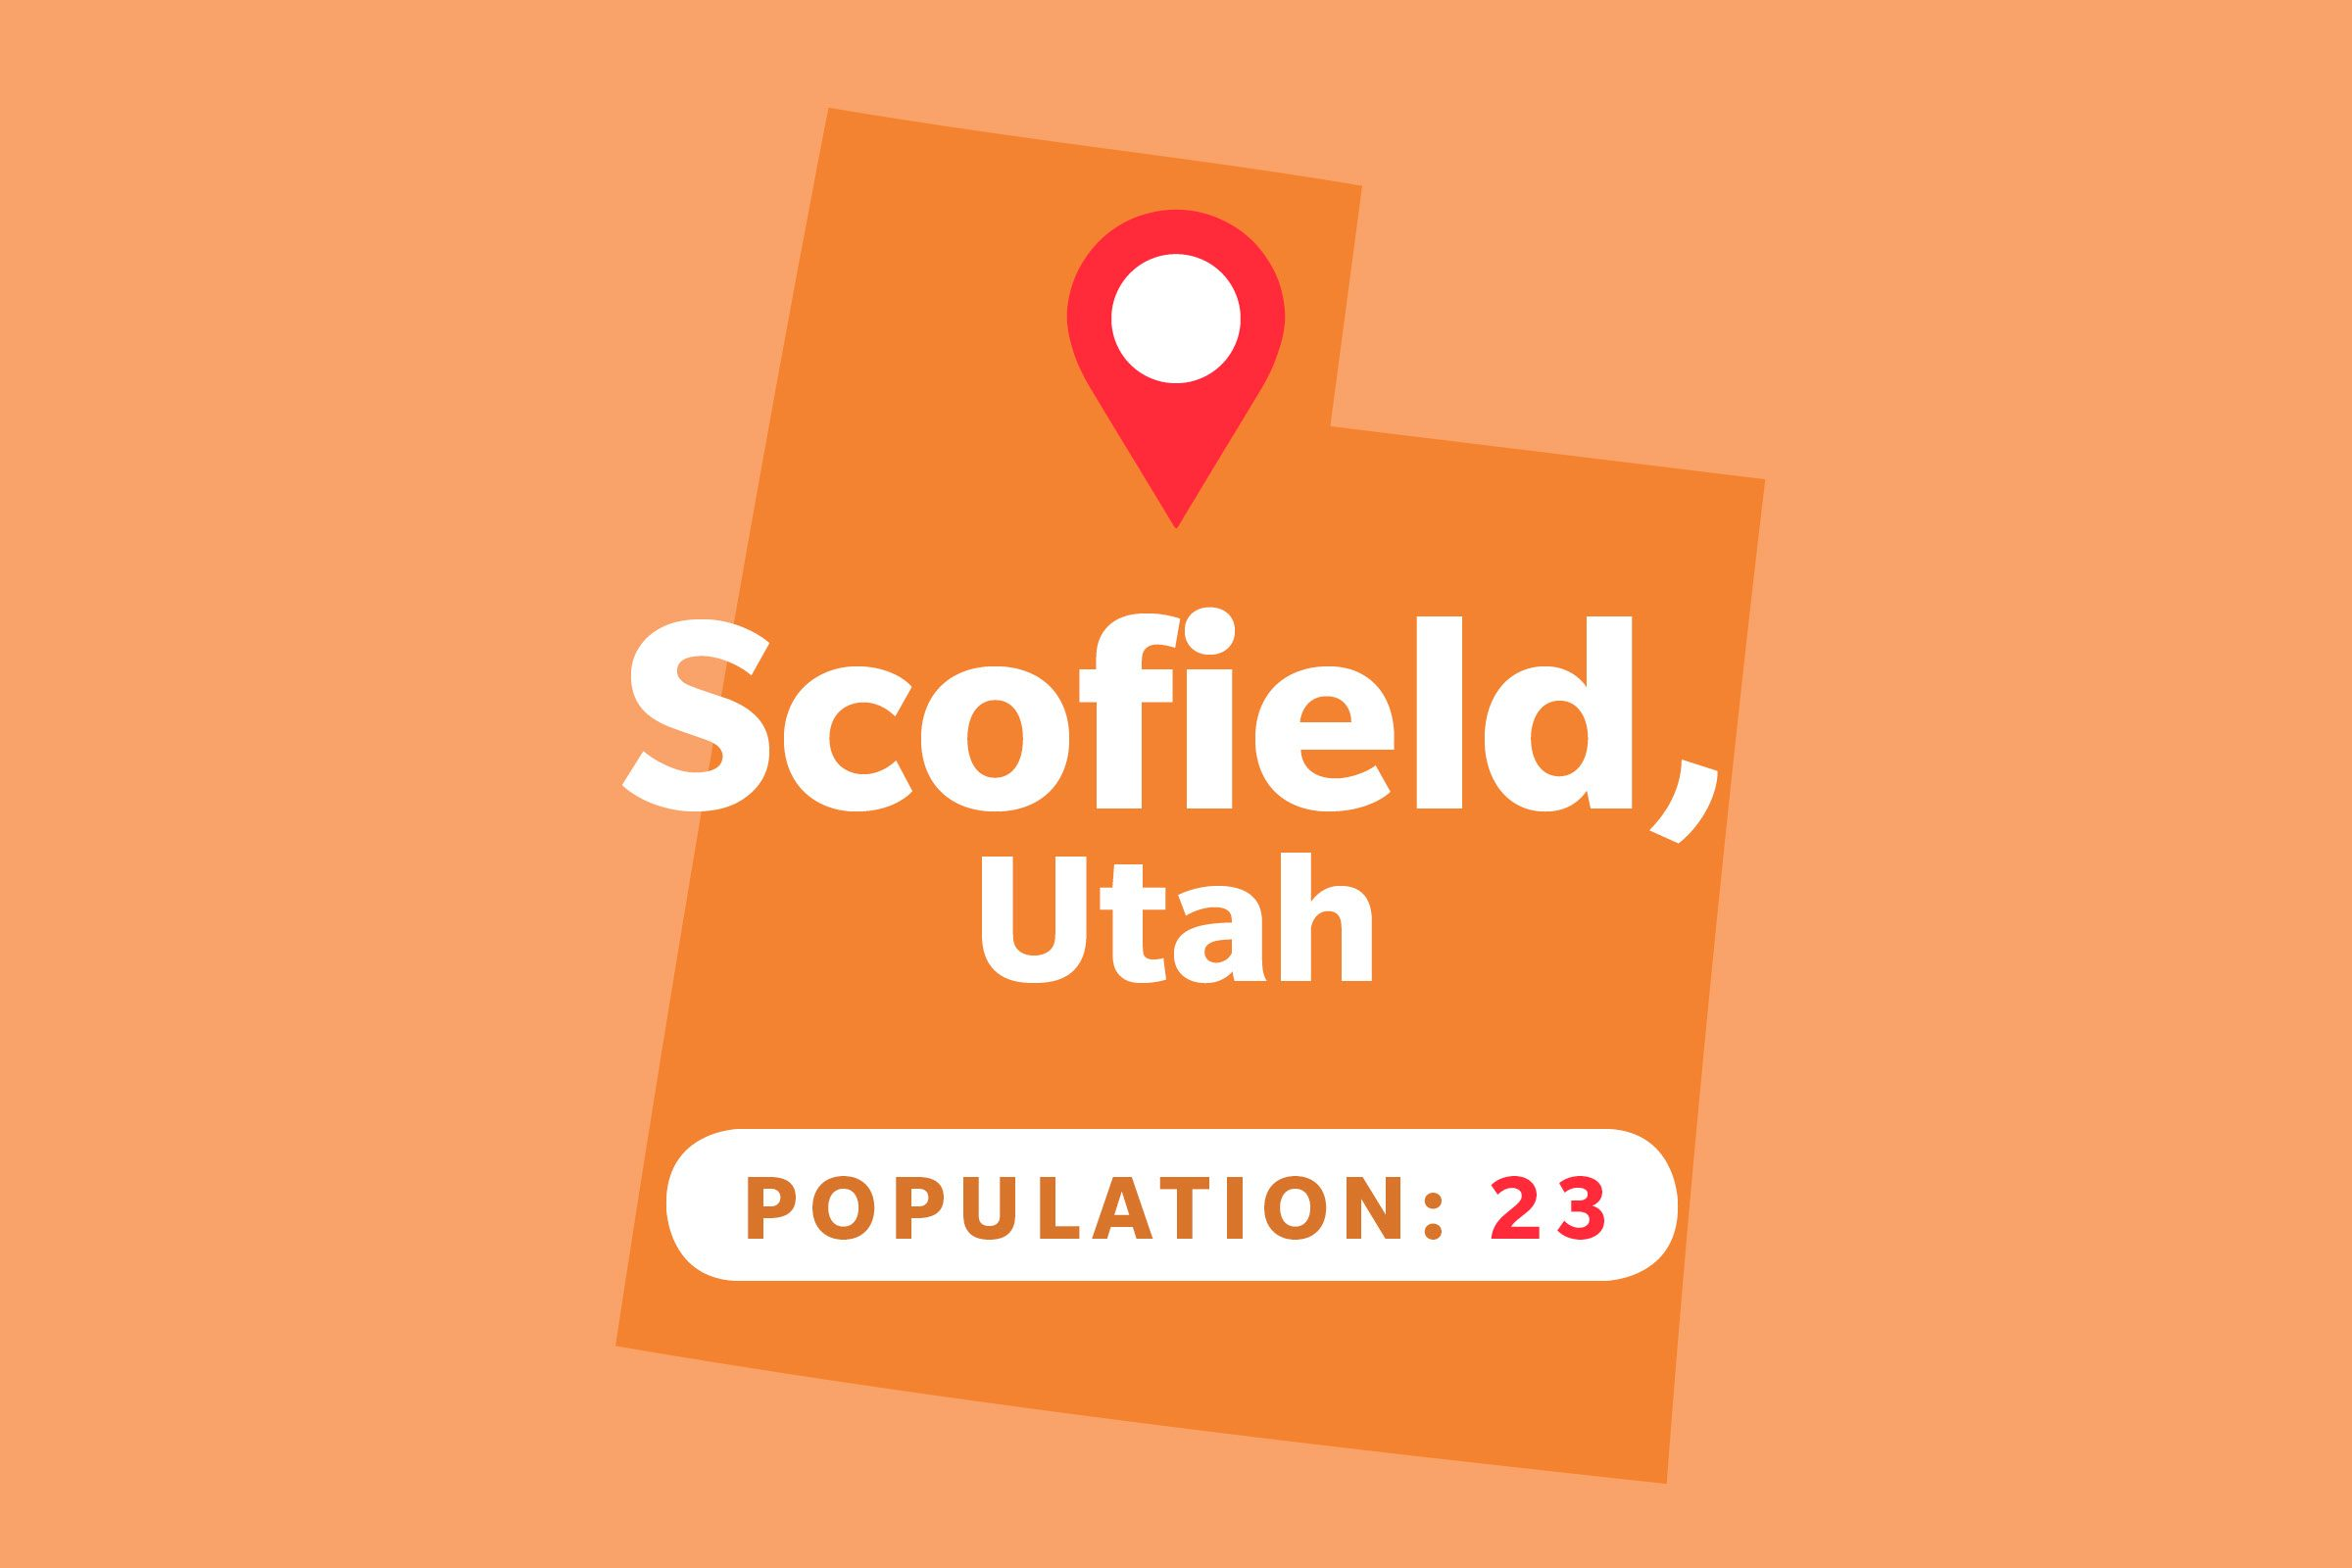 Scofield, Utah